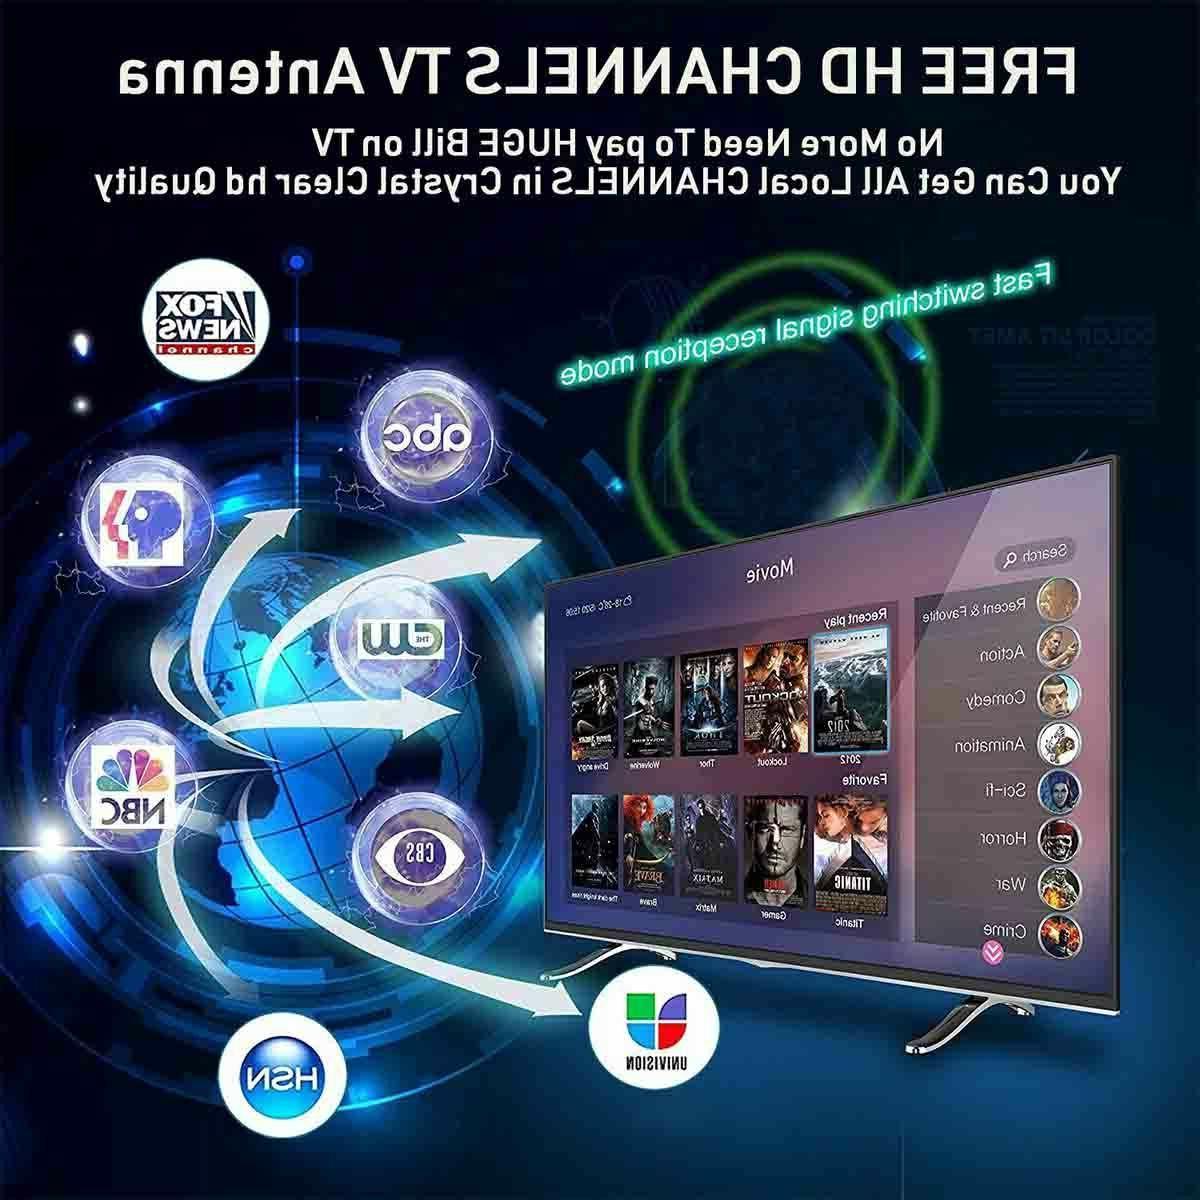 SUPER HIGH TV HDTV DTV 320 MILES INDOOR